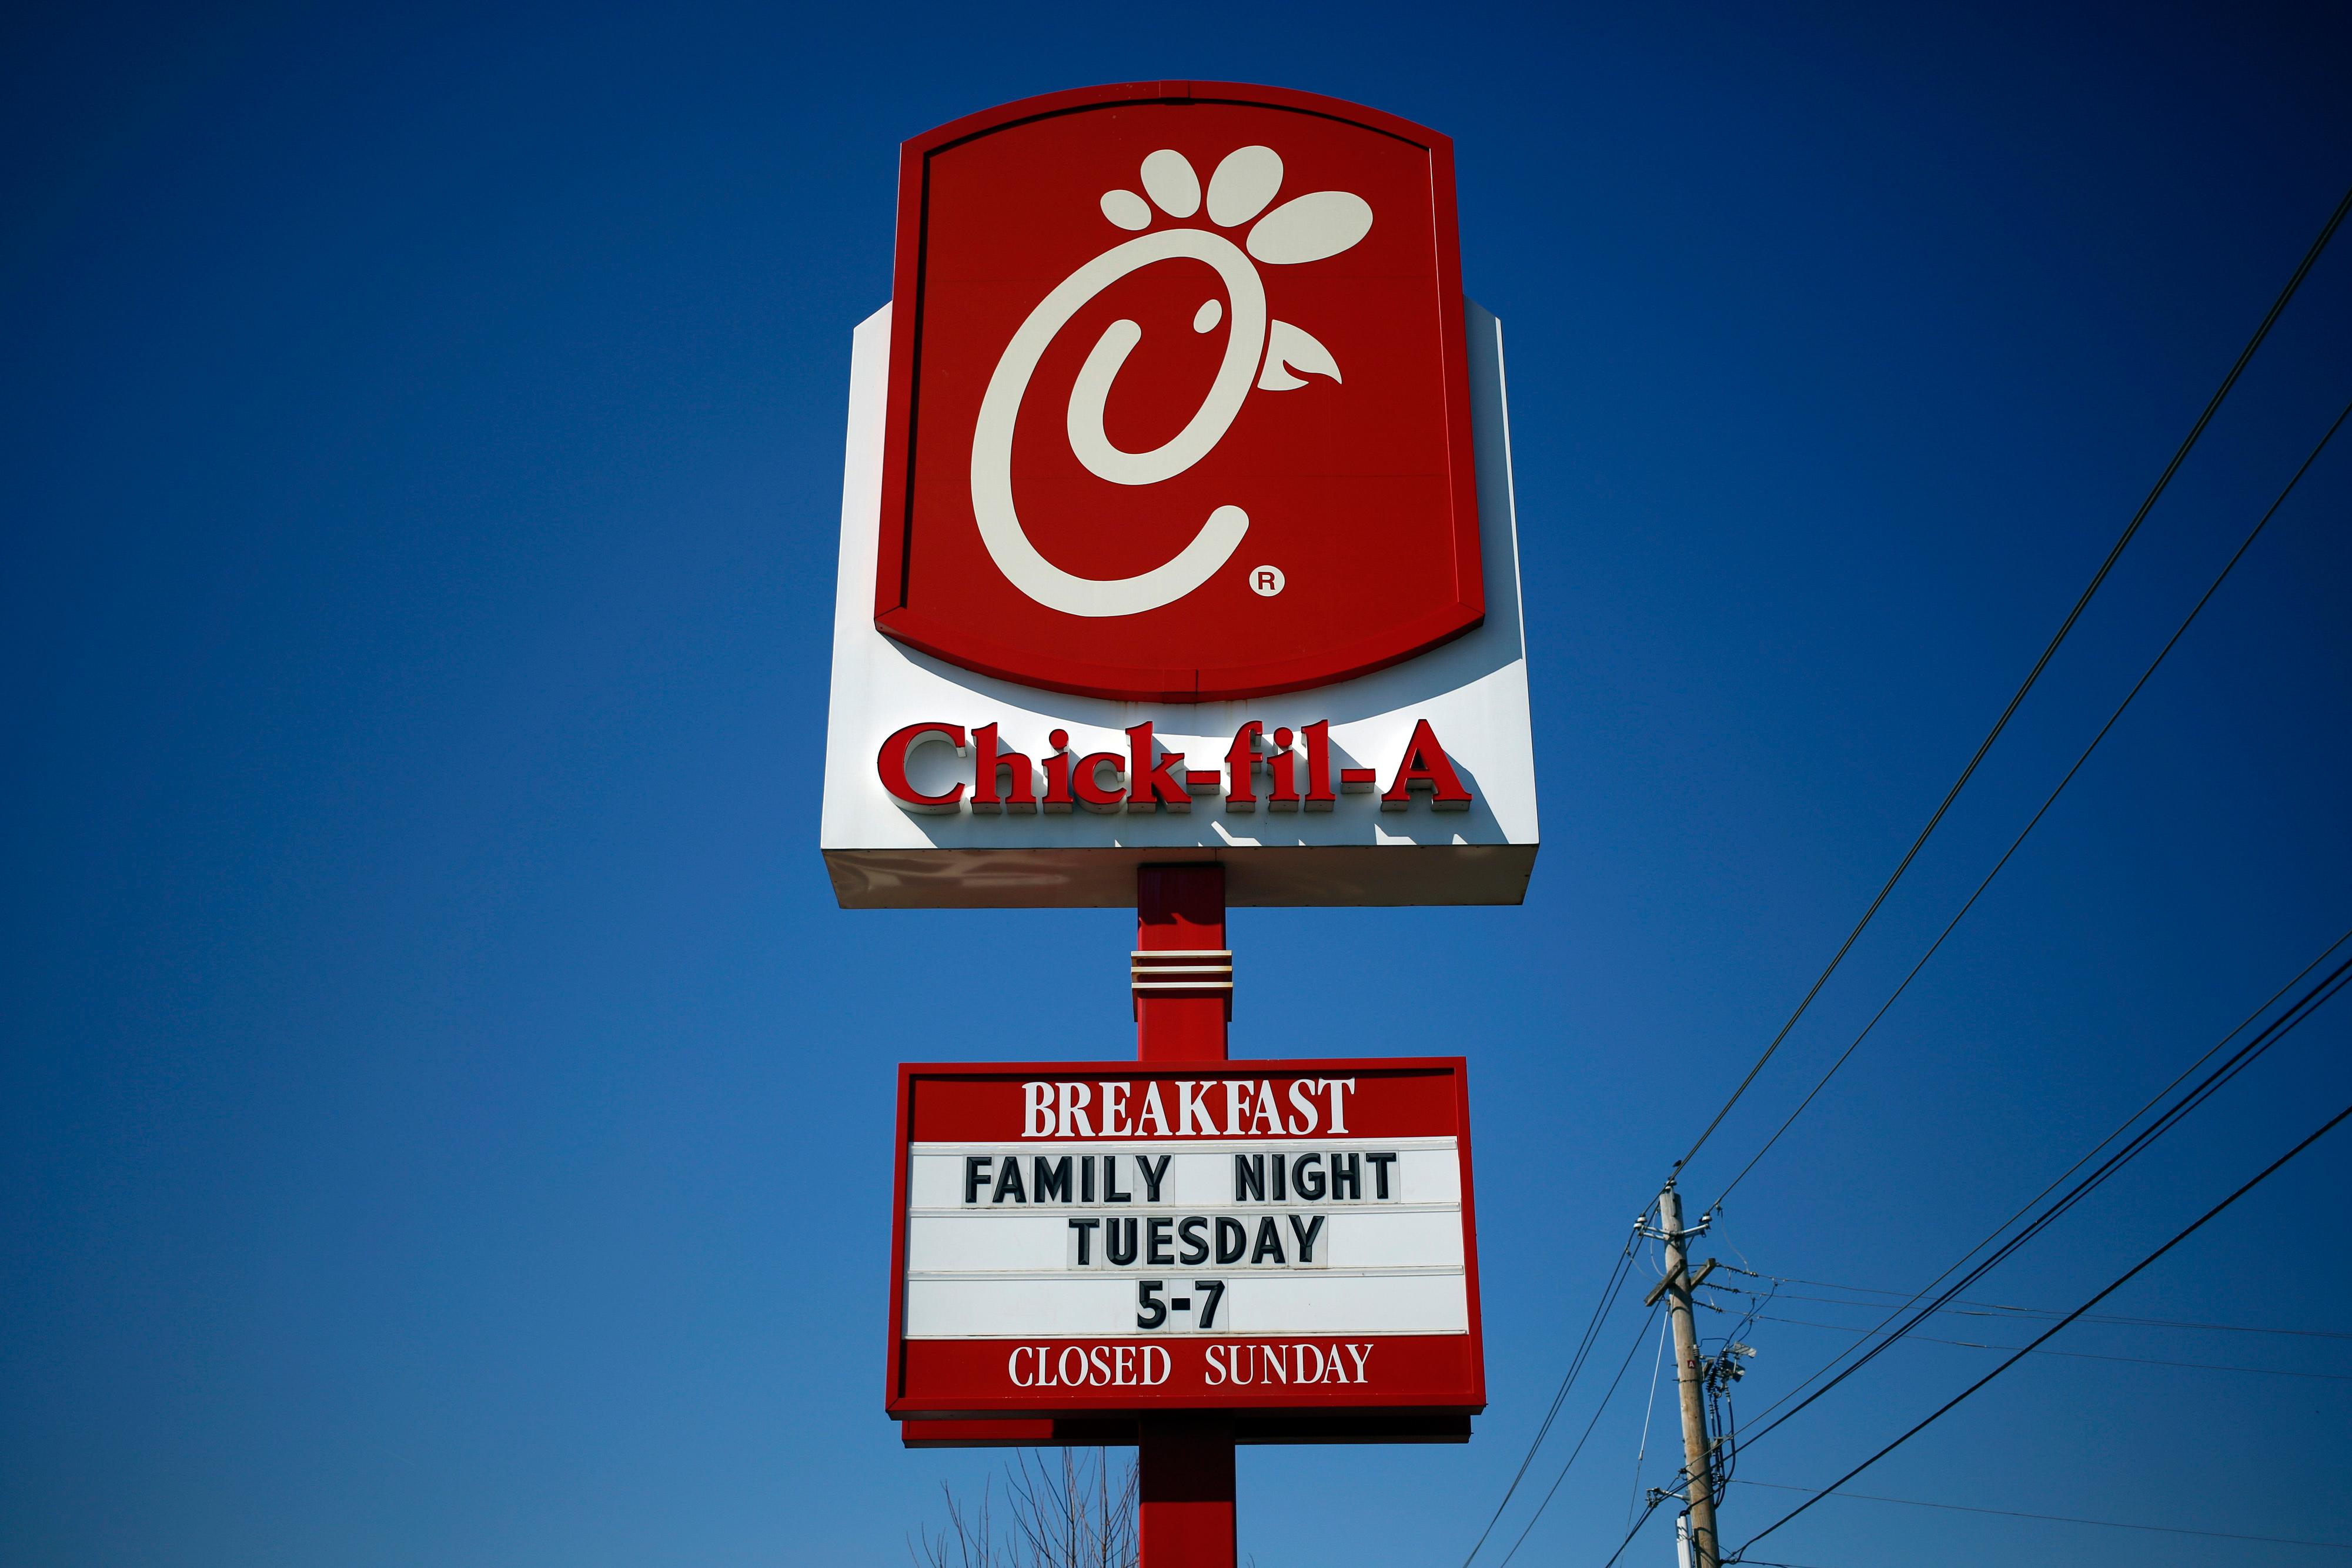 Chick-fil-A Inc. restaurant in Bowling Green, Kentucky.